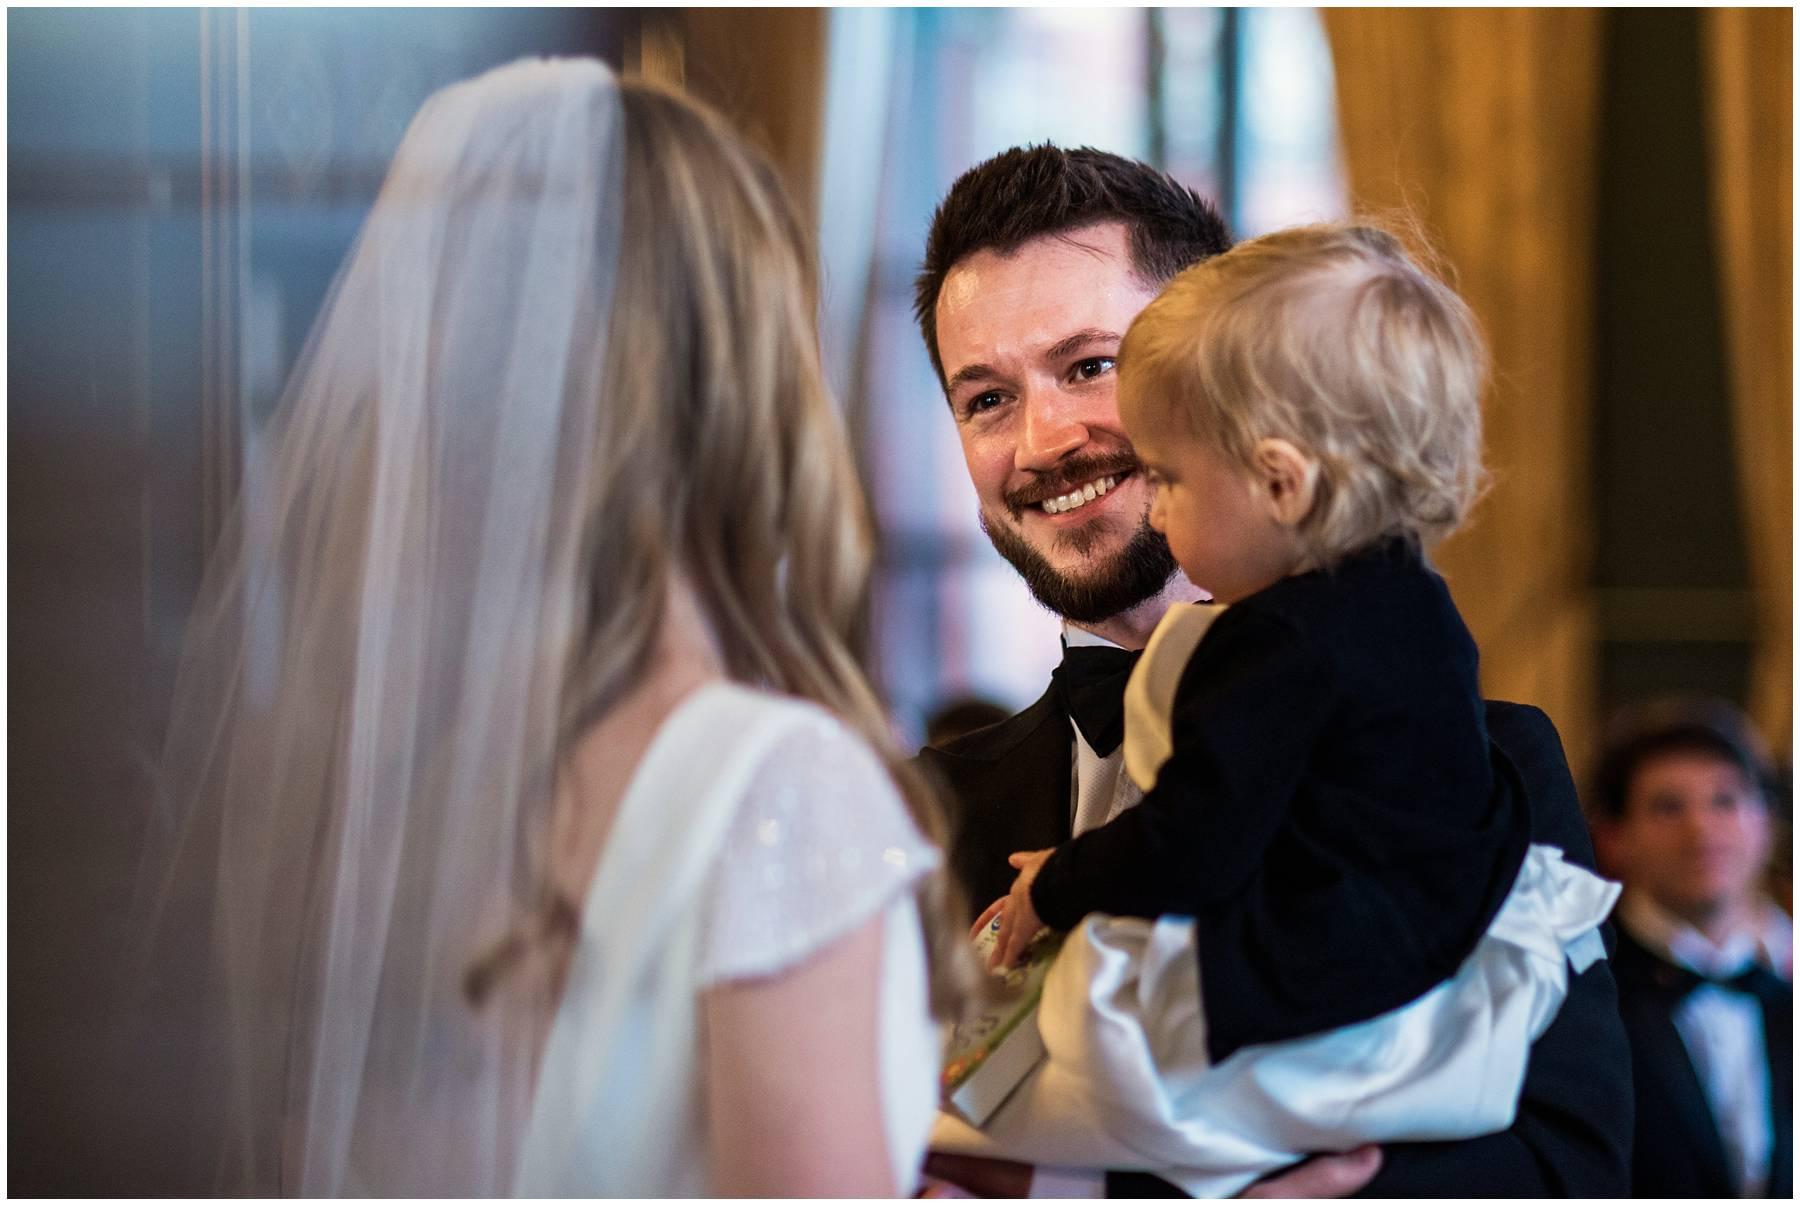 Wedding ceremony at St Pancras Renaissance Hotel